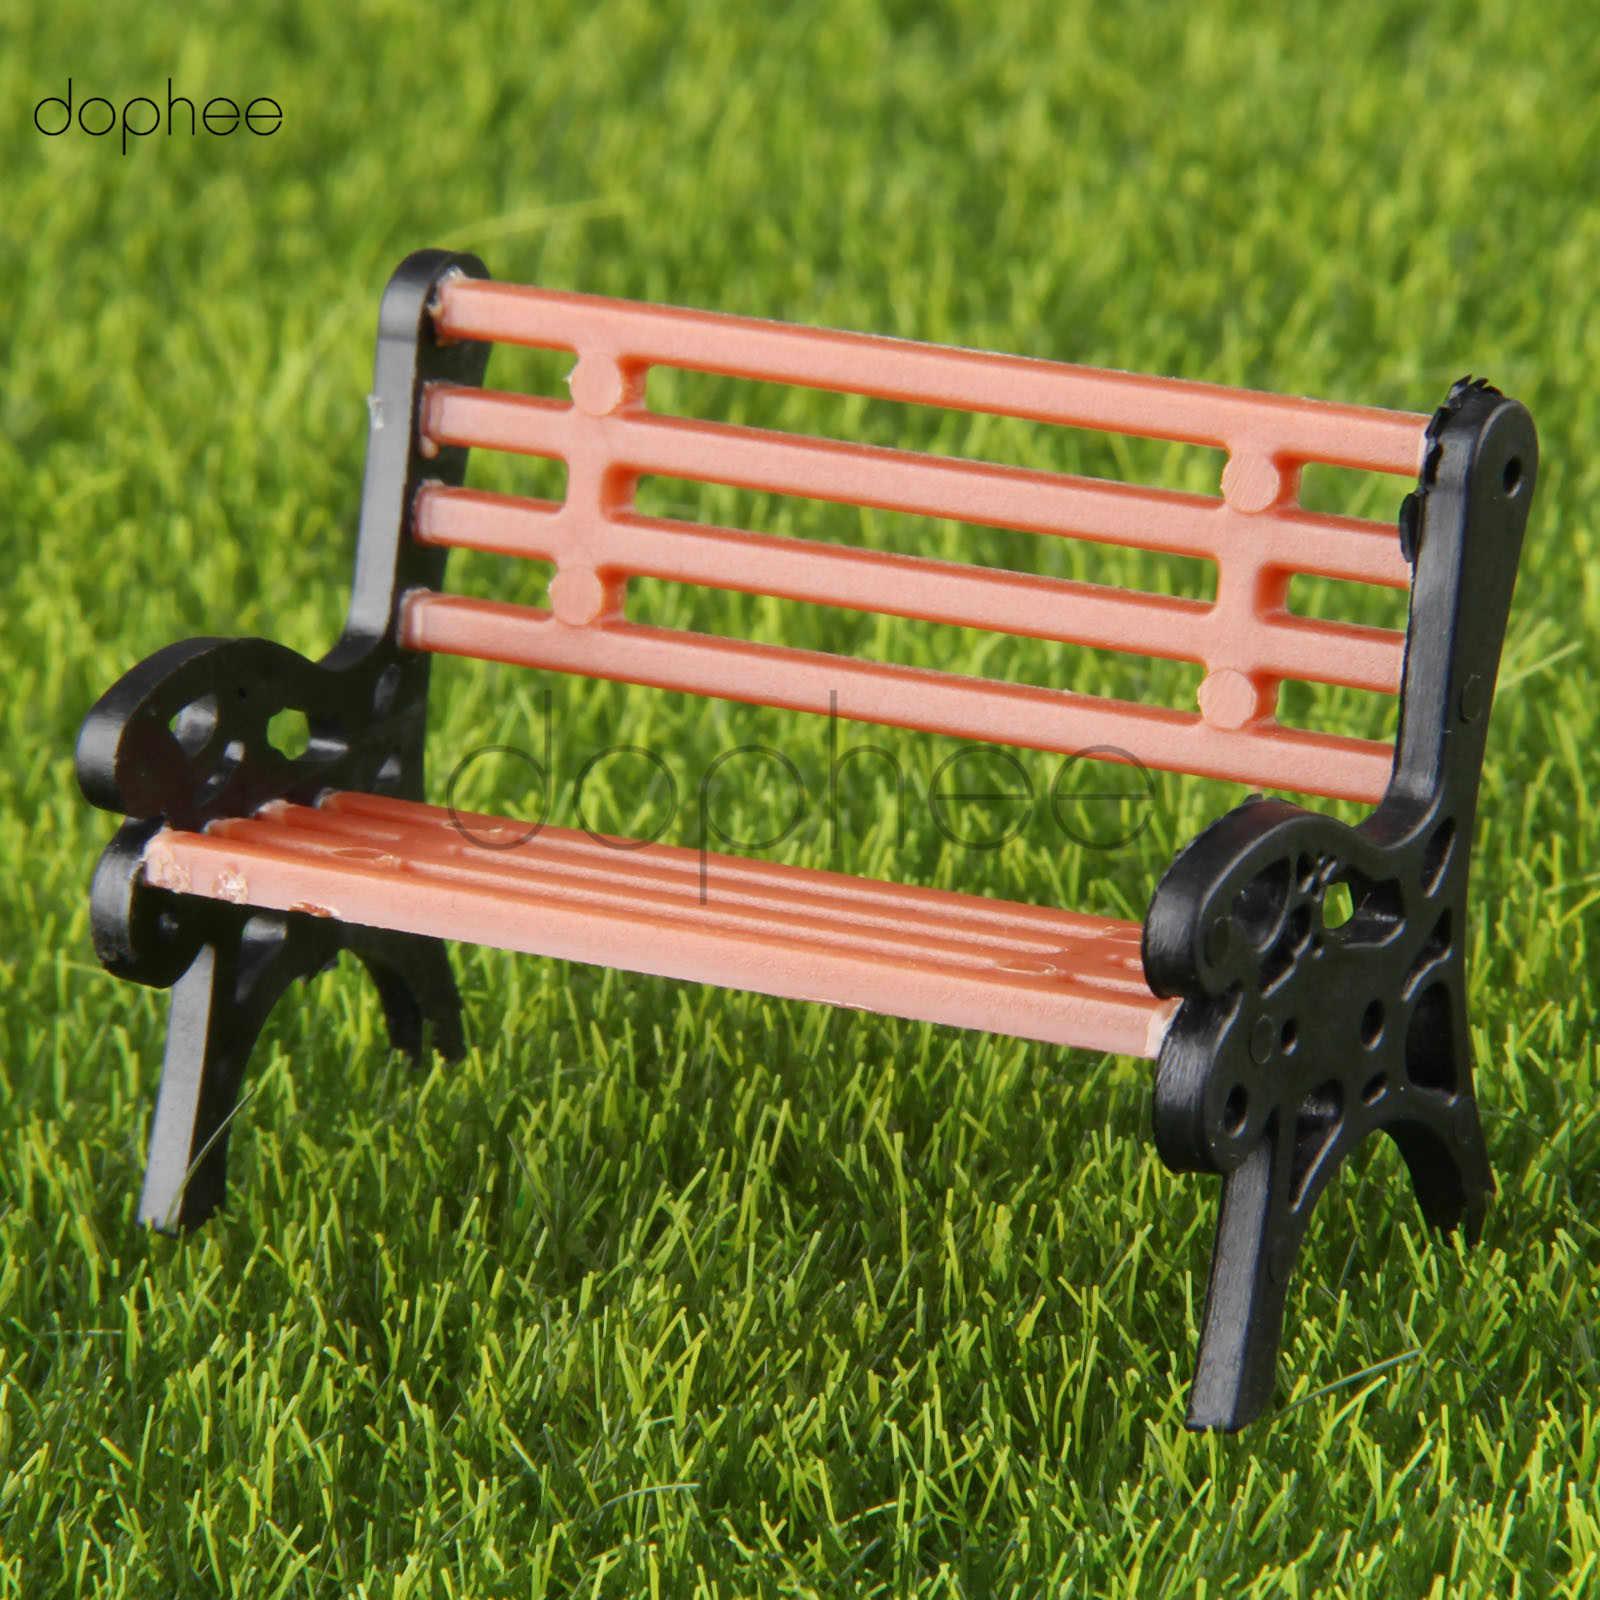 Awesome Dophee 5Pcs Model Park Bench 1 30 Mini Garden Ornament Miniature Park Bench Craft Diy House Decor Bench Model Camellatalisay Diy Chair Ideas Camellatalisaycom